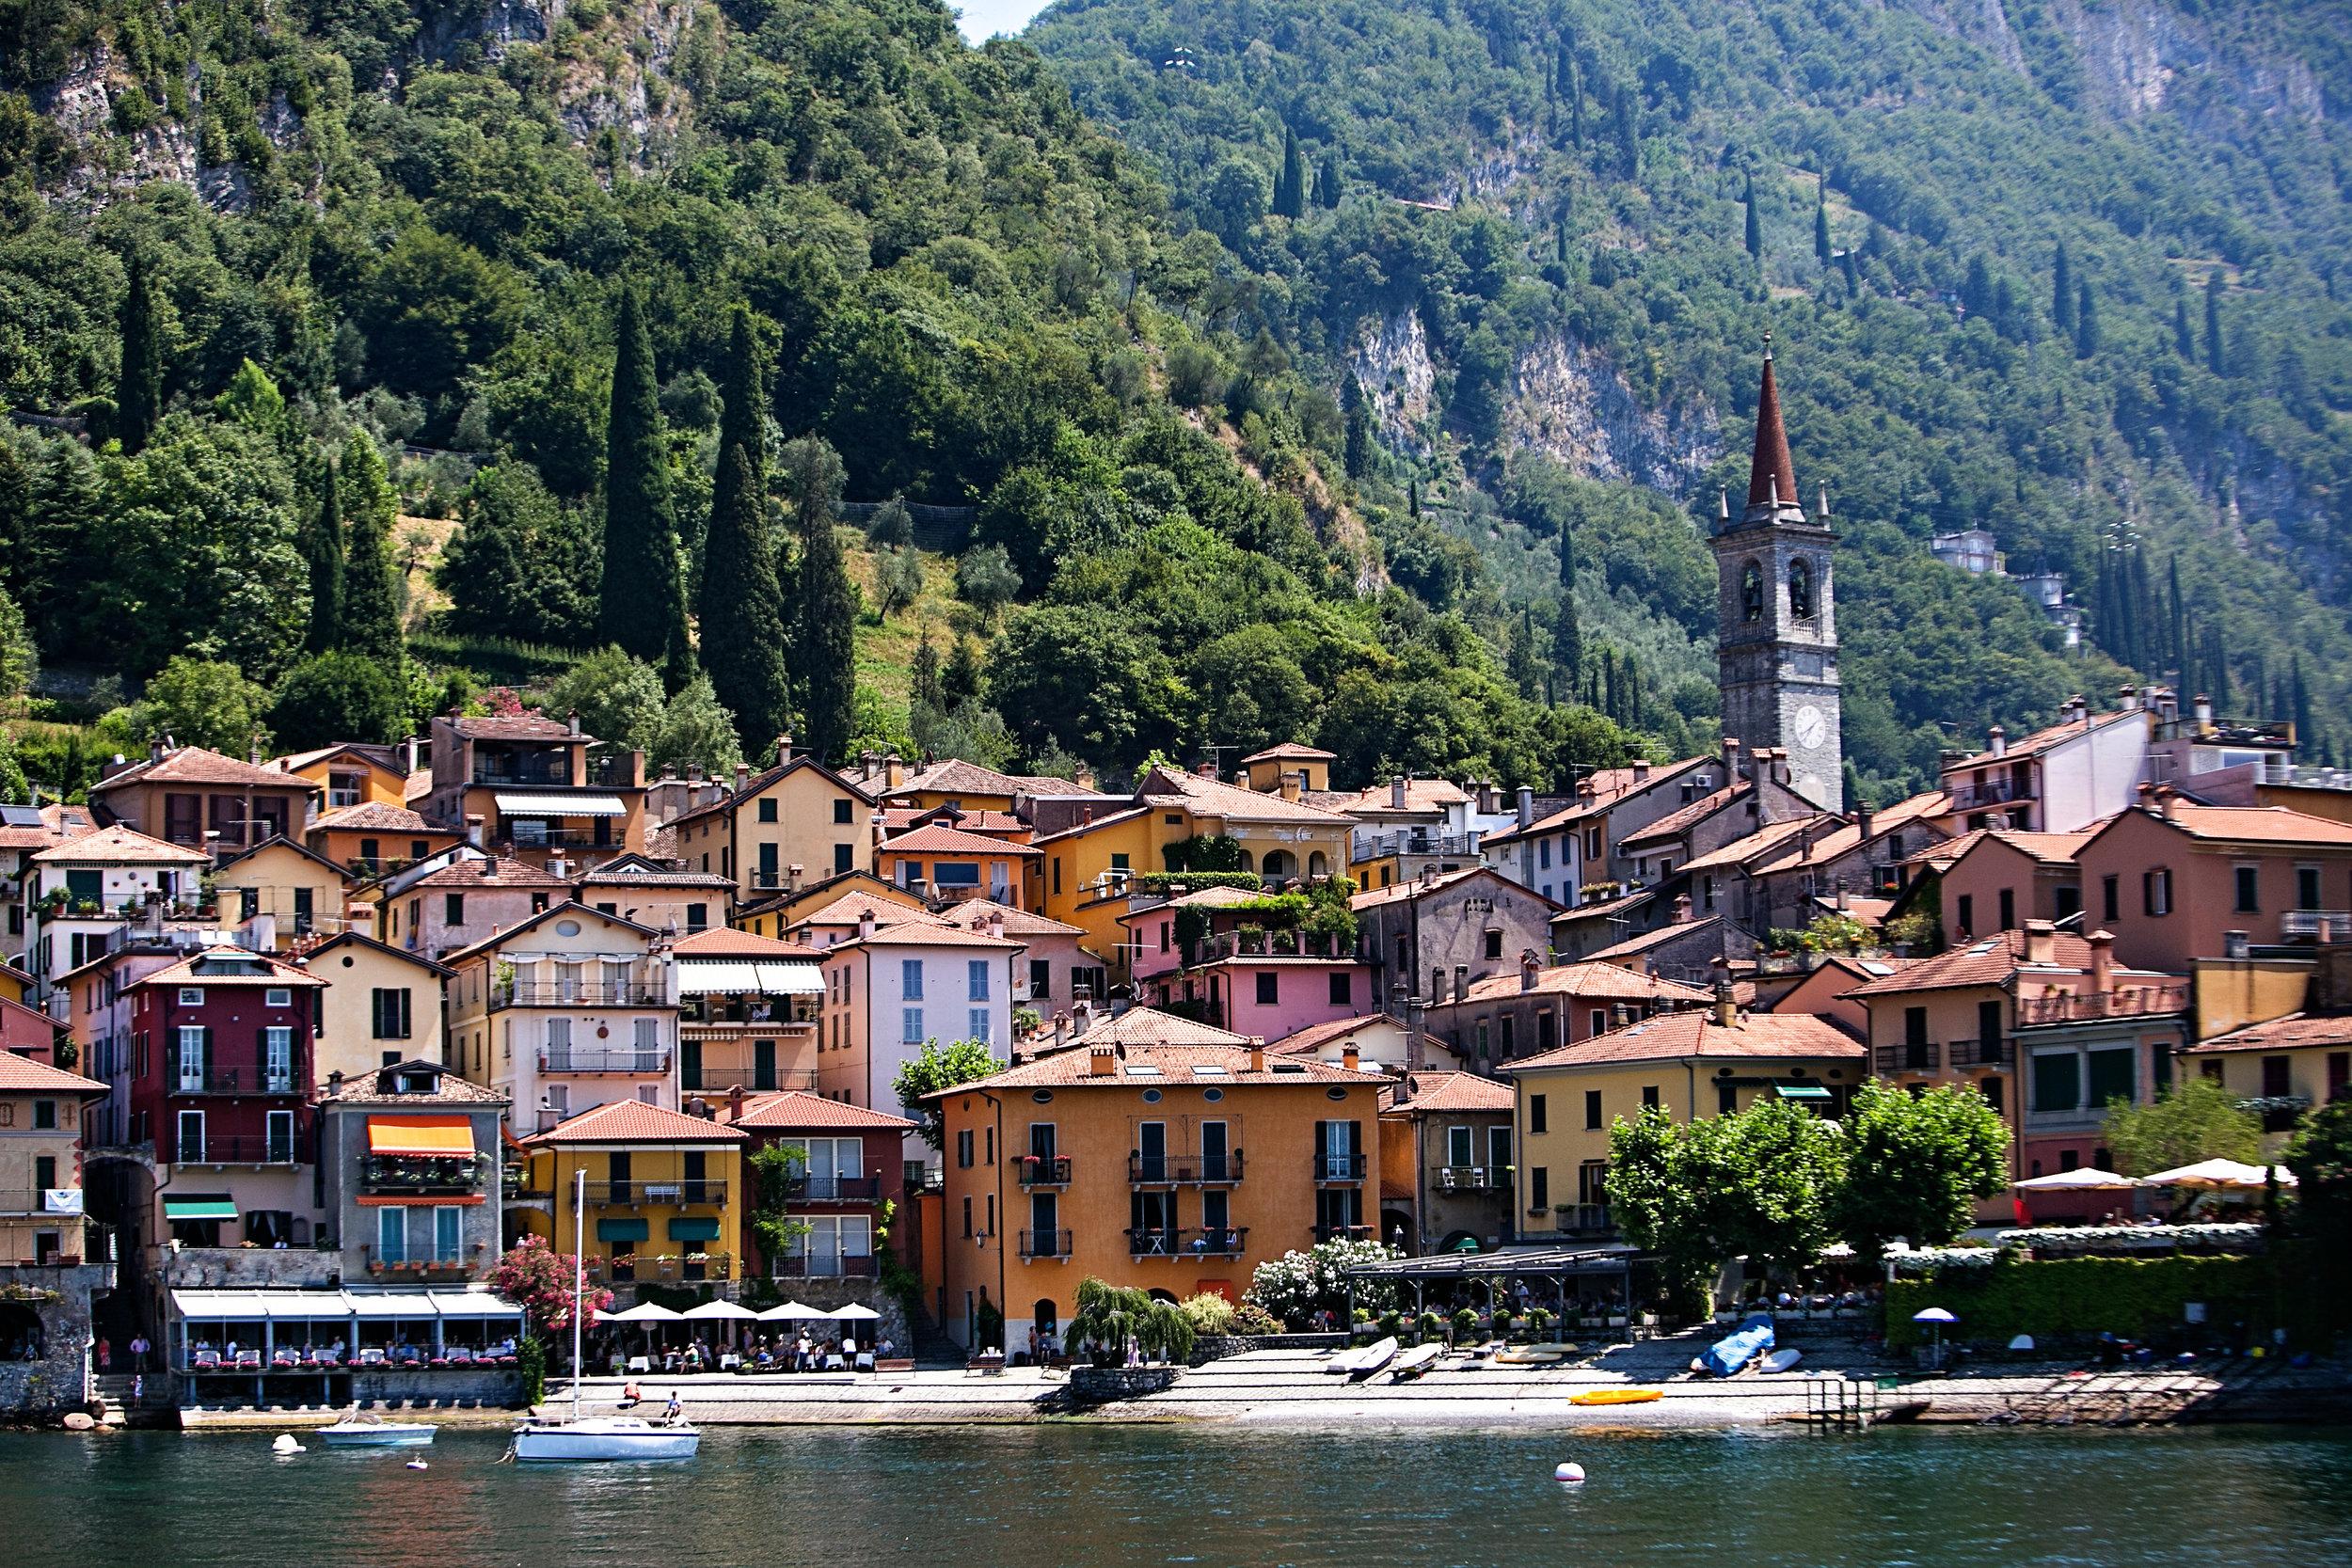 Italy2015-4126-2.jpg